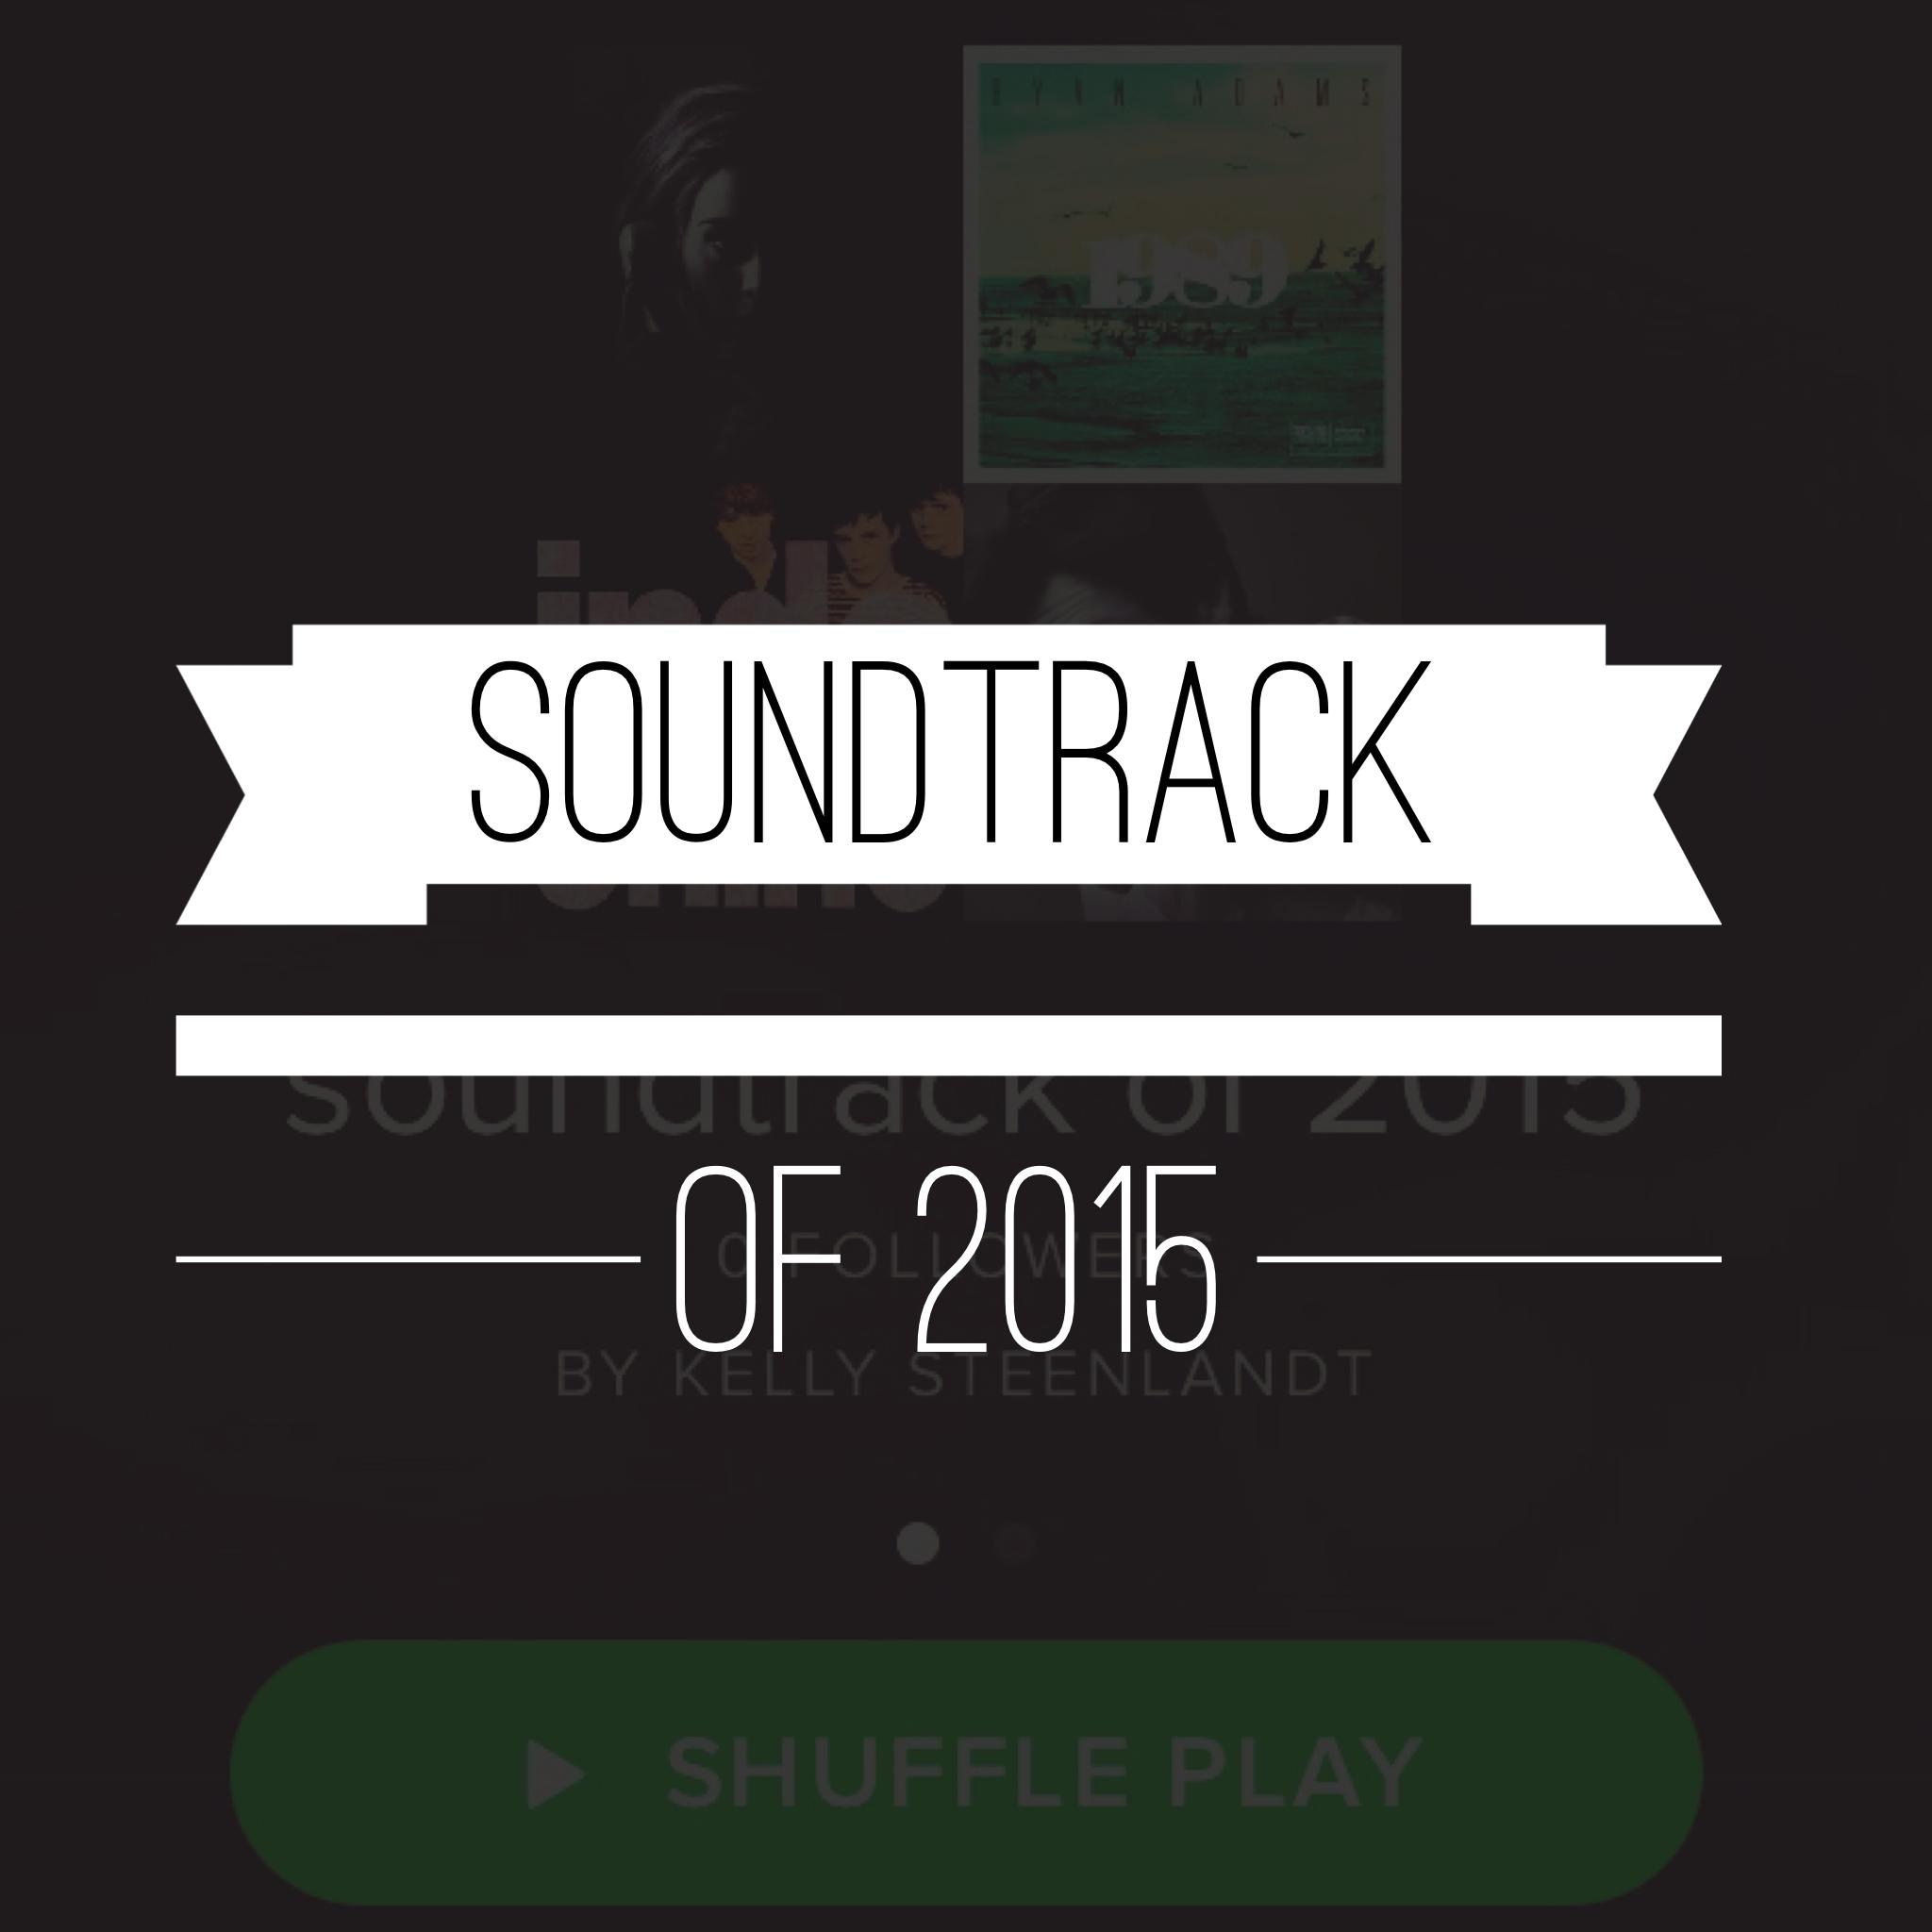 soundtrack of 2015